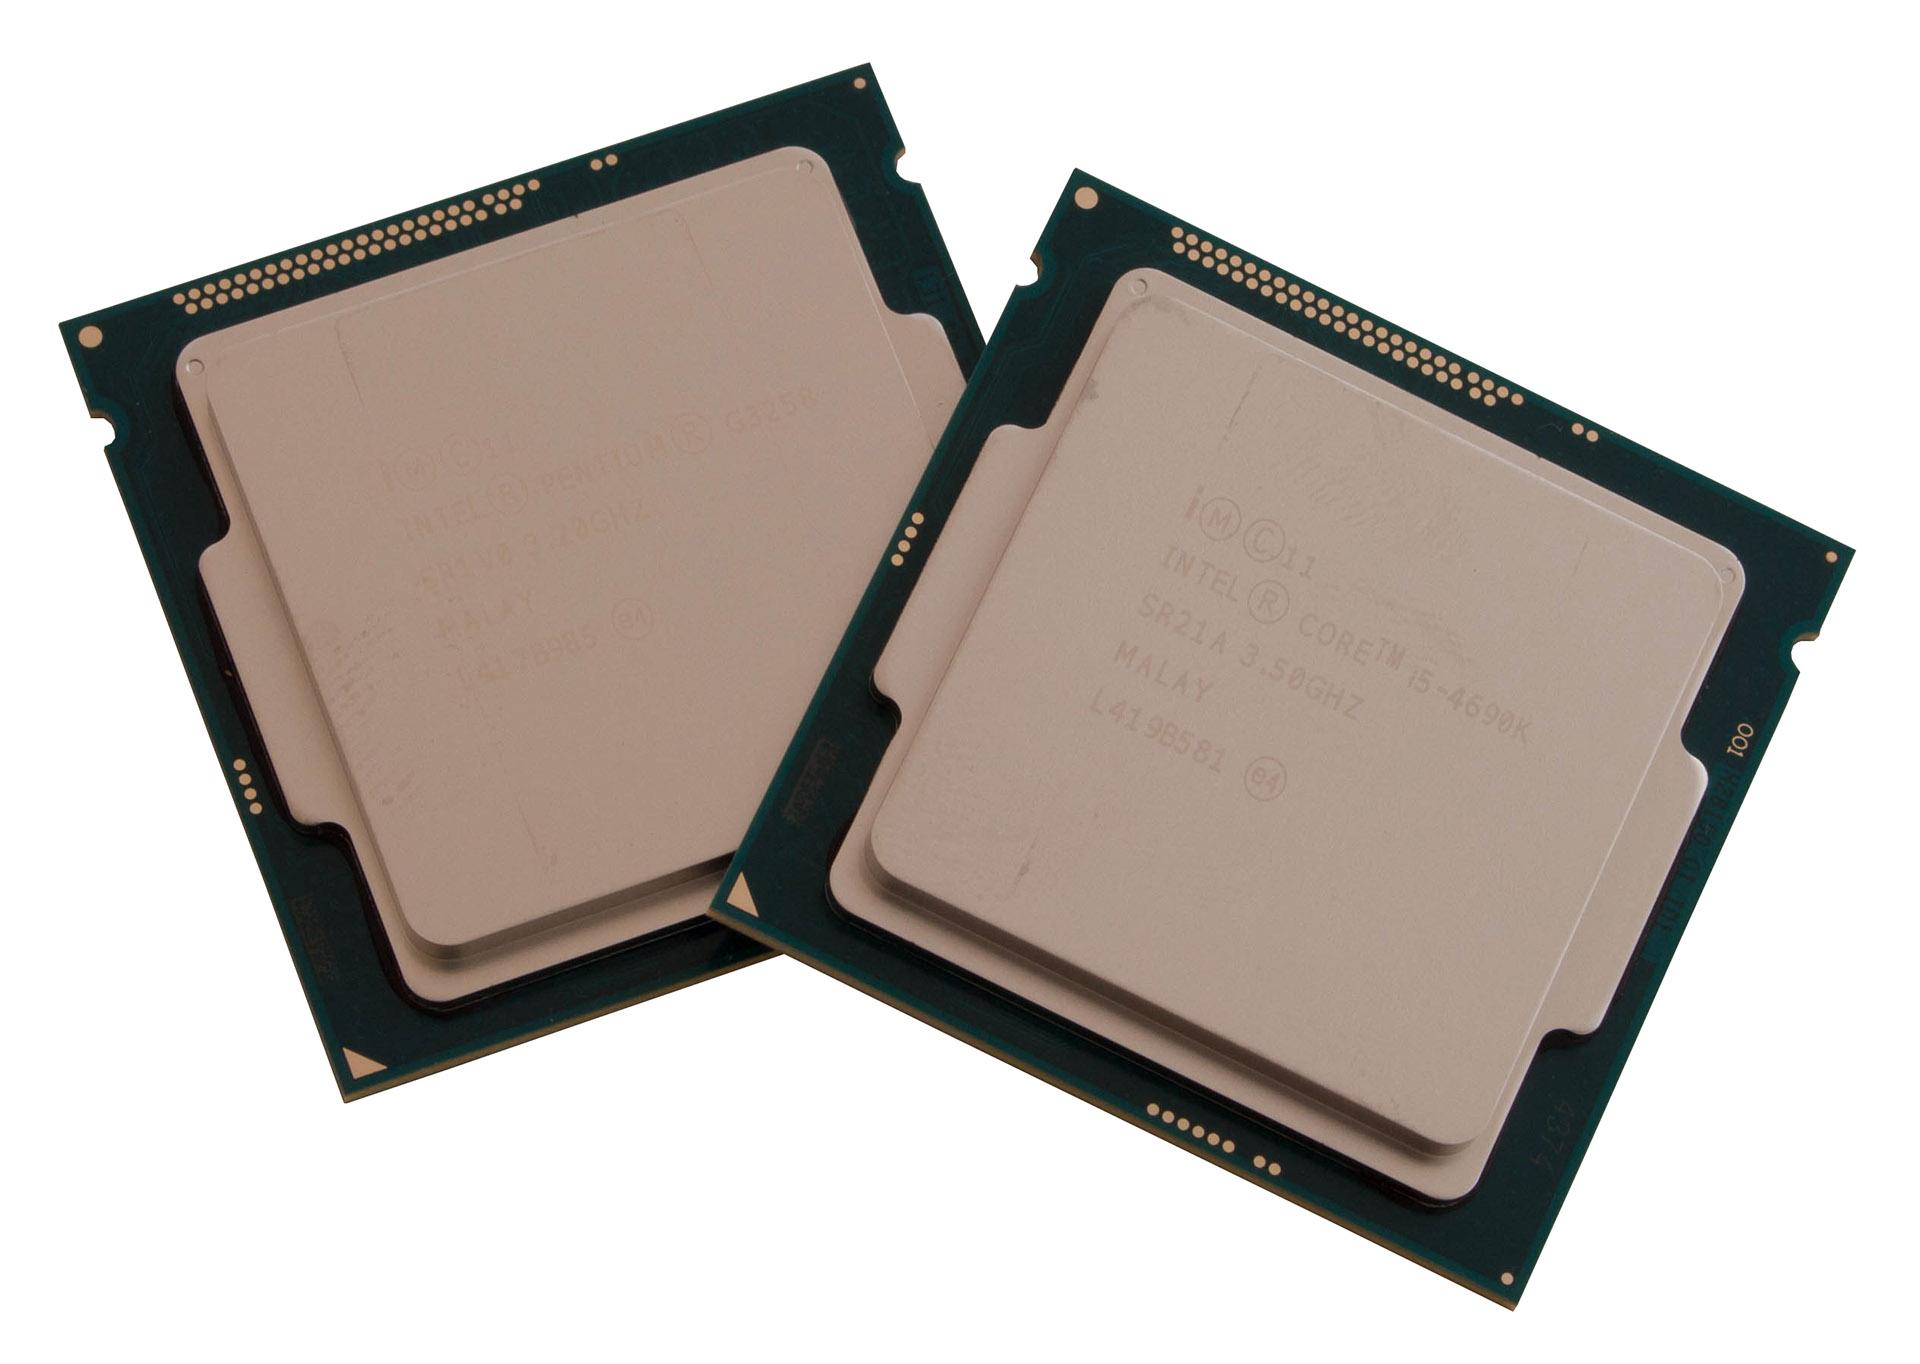 Intel Core i5-4690K & Pentium G3258 test